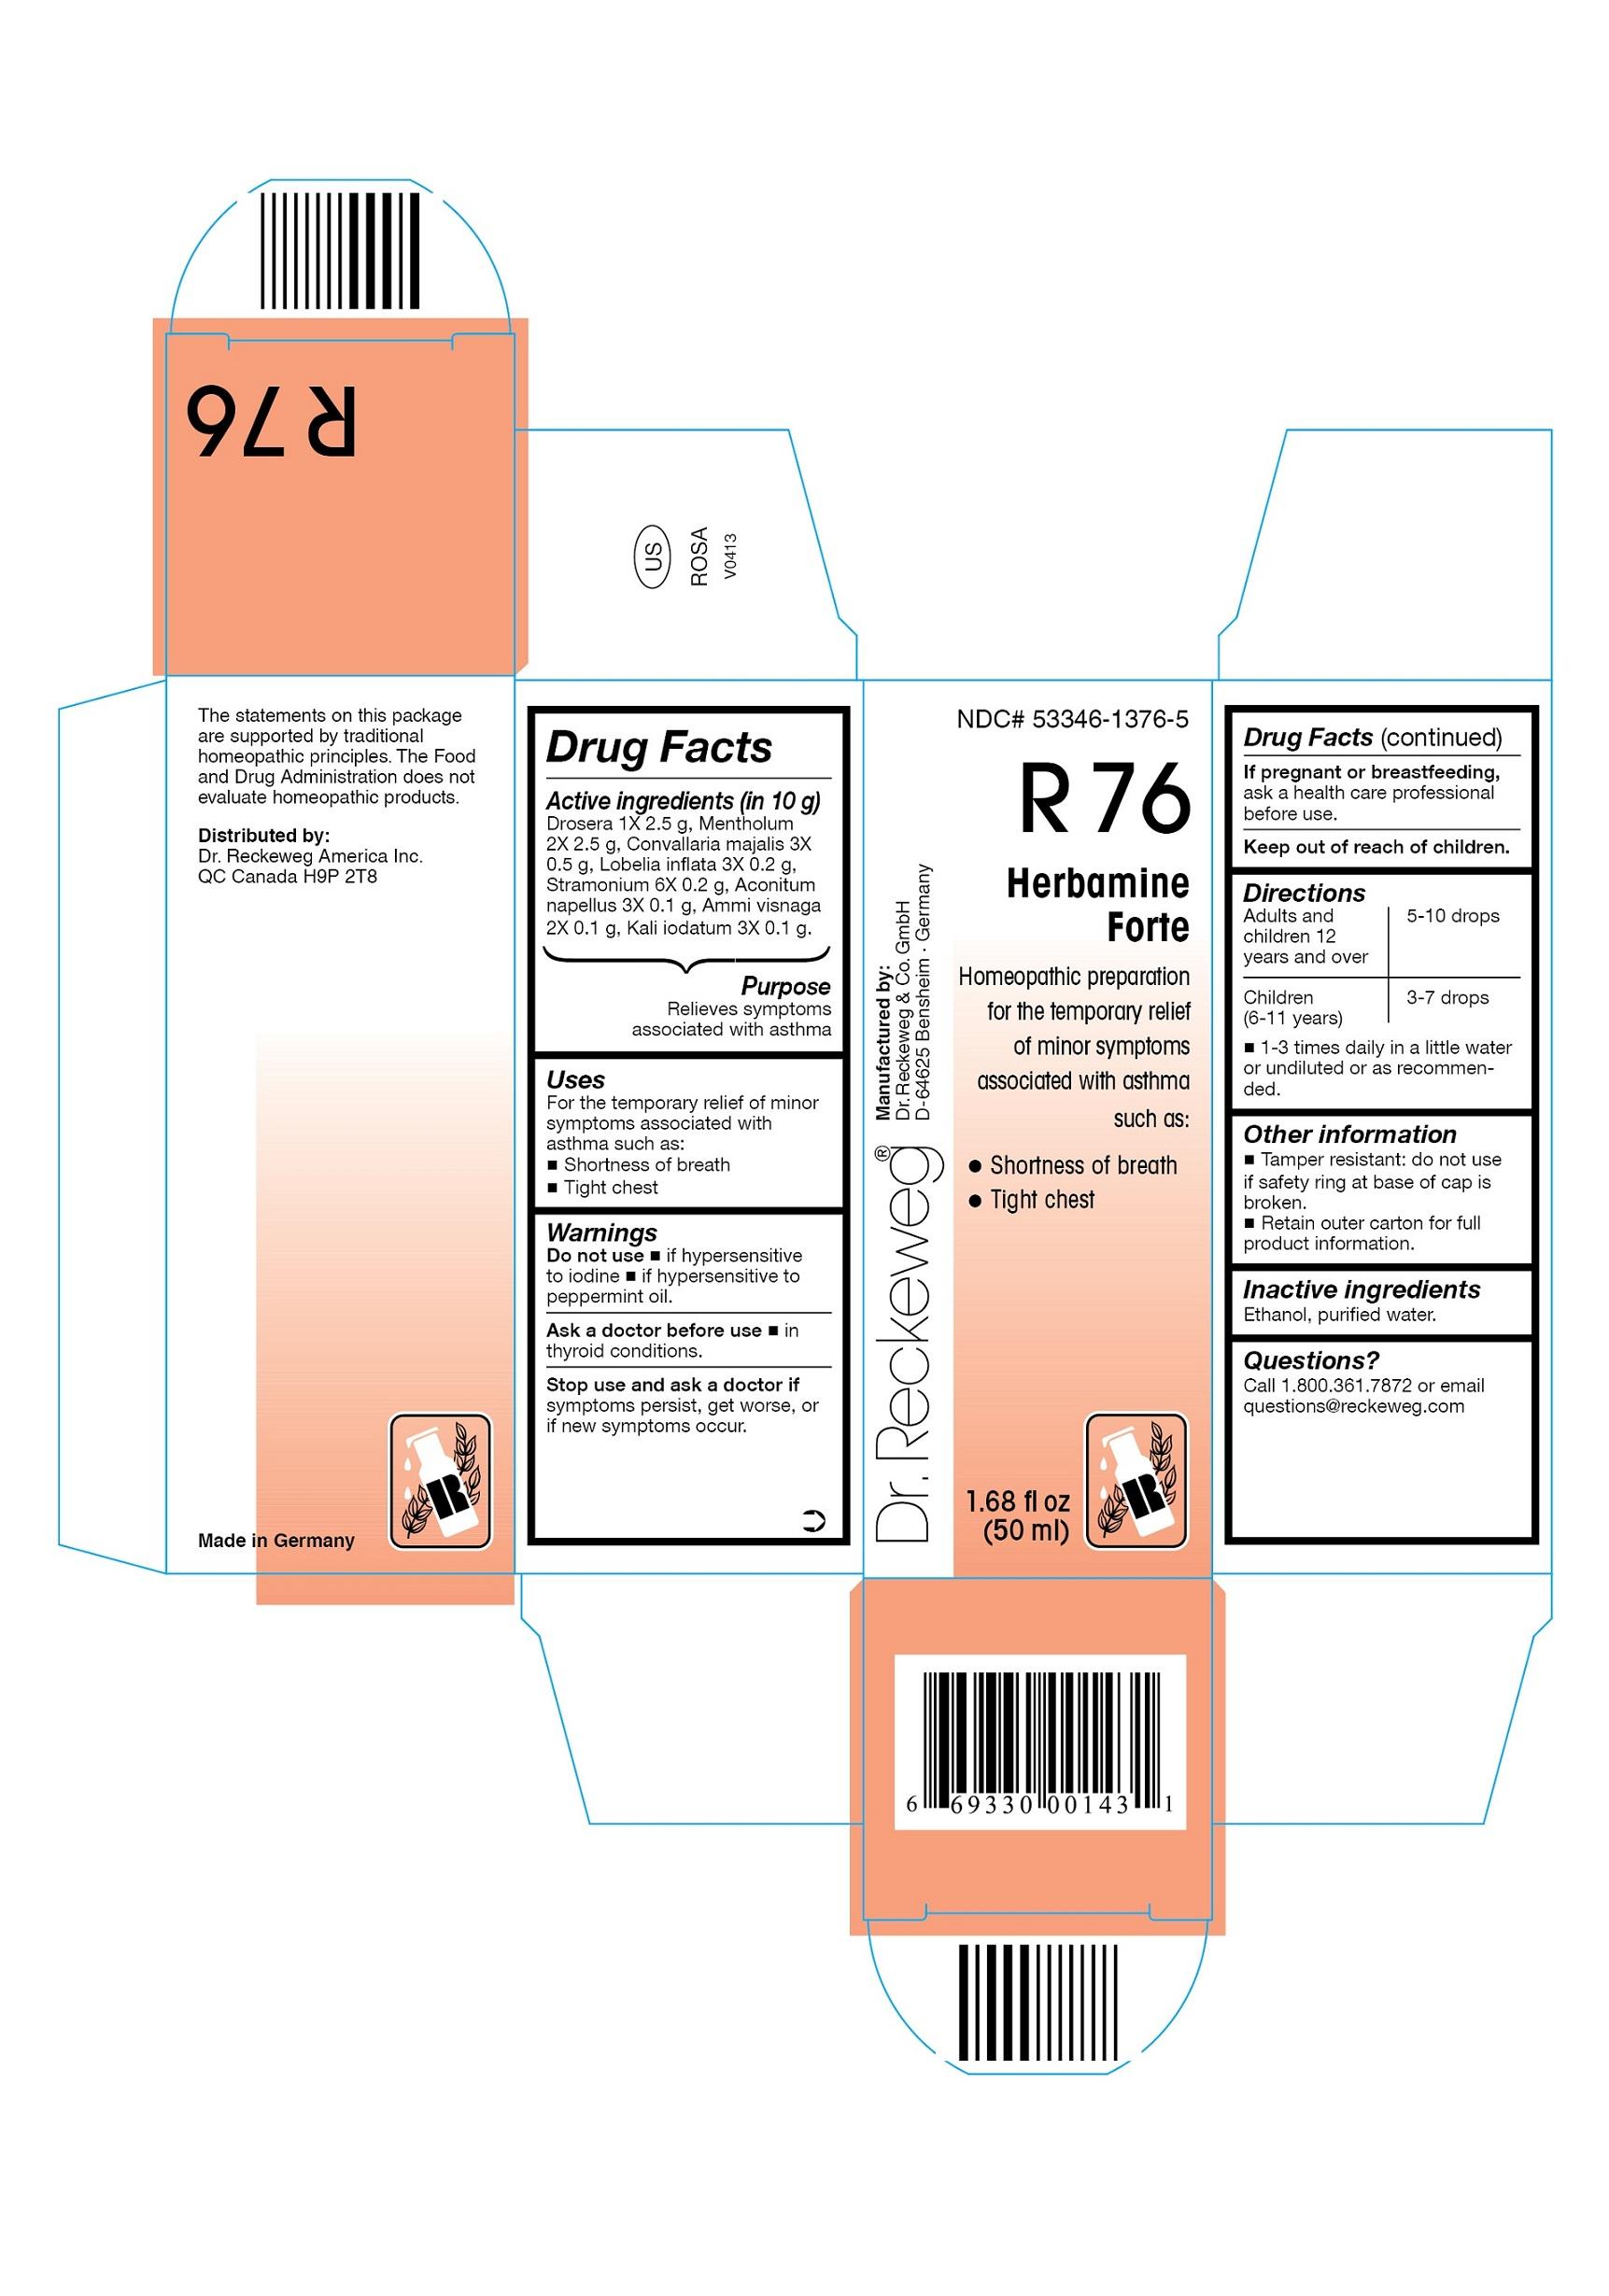 Dr. Reckeweg R76 Herbamine Forte Combination Product (Drosera 1x, Mentholum 2x, Convallaria Majalis 3x, Lobelia Inflata 3x, Stramonium 6x, Aconitum Napellus 3x, Ammi Visnaga 2x, Kali Iodatum 3x) Liquid [Pharmazeutische Fabrik Dr. Reckeweg & Co]